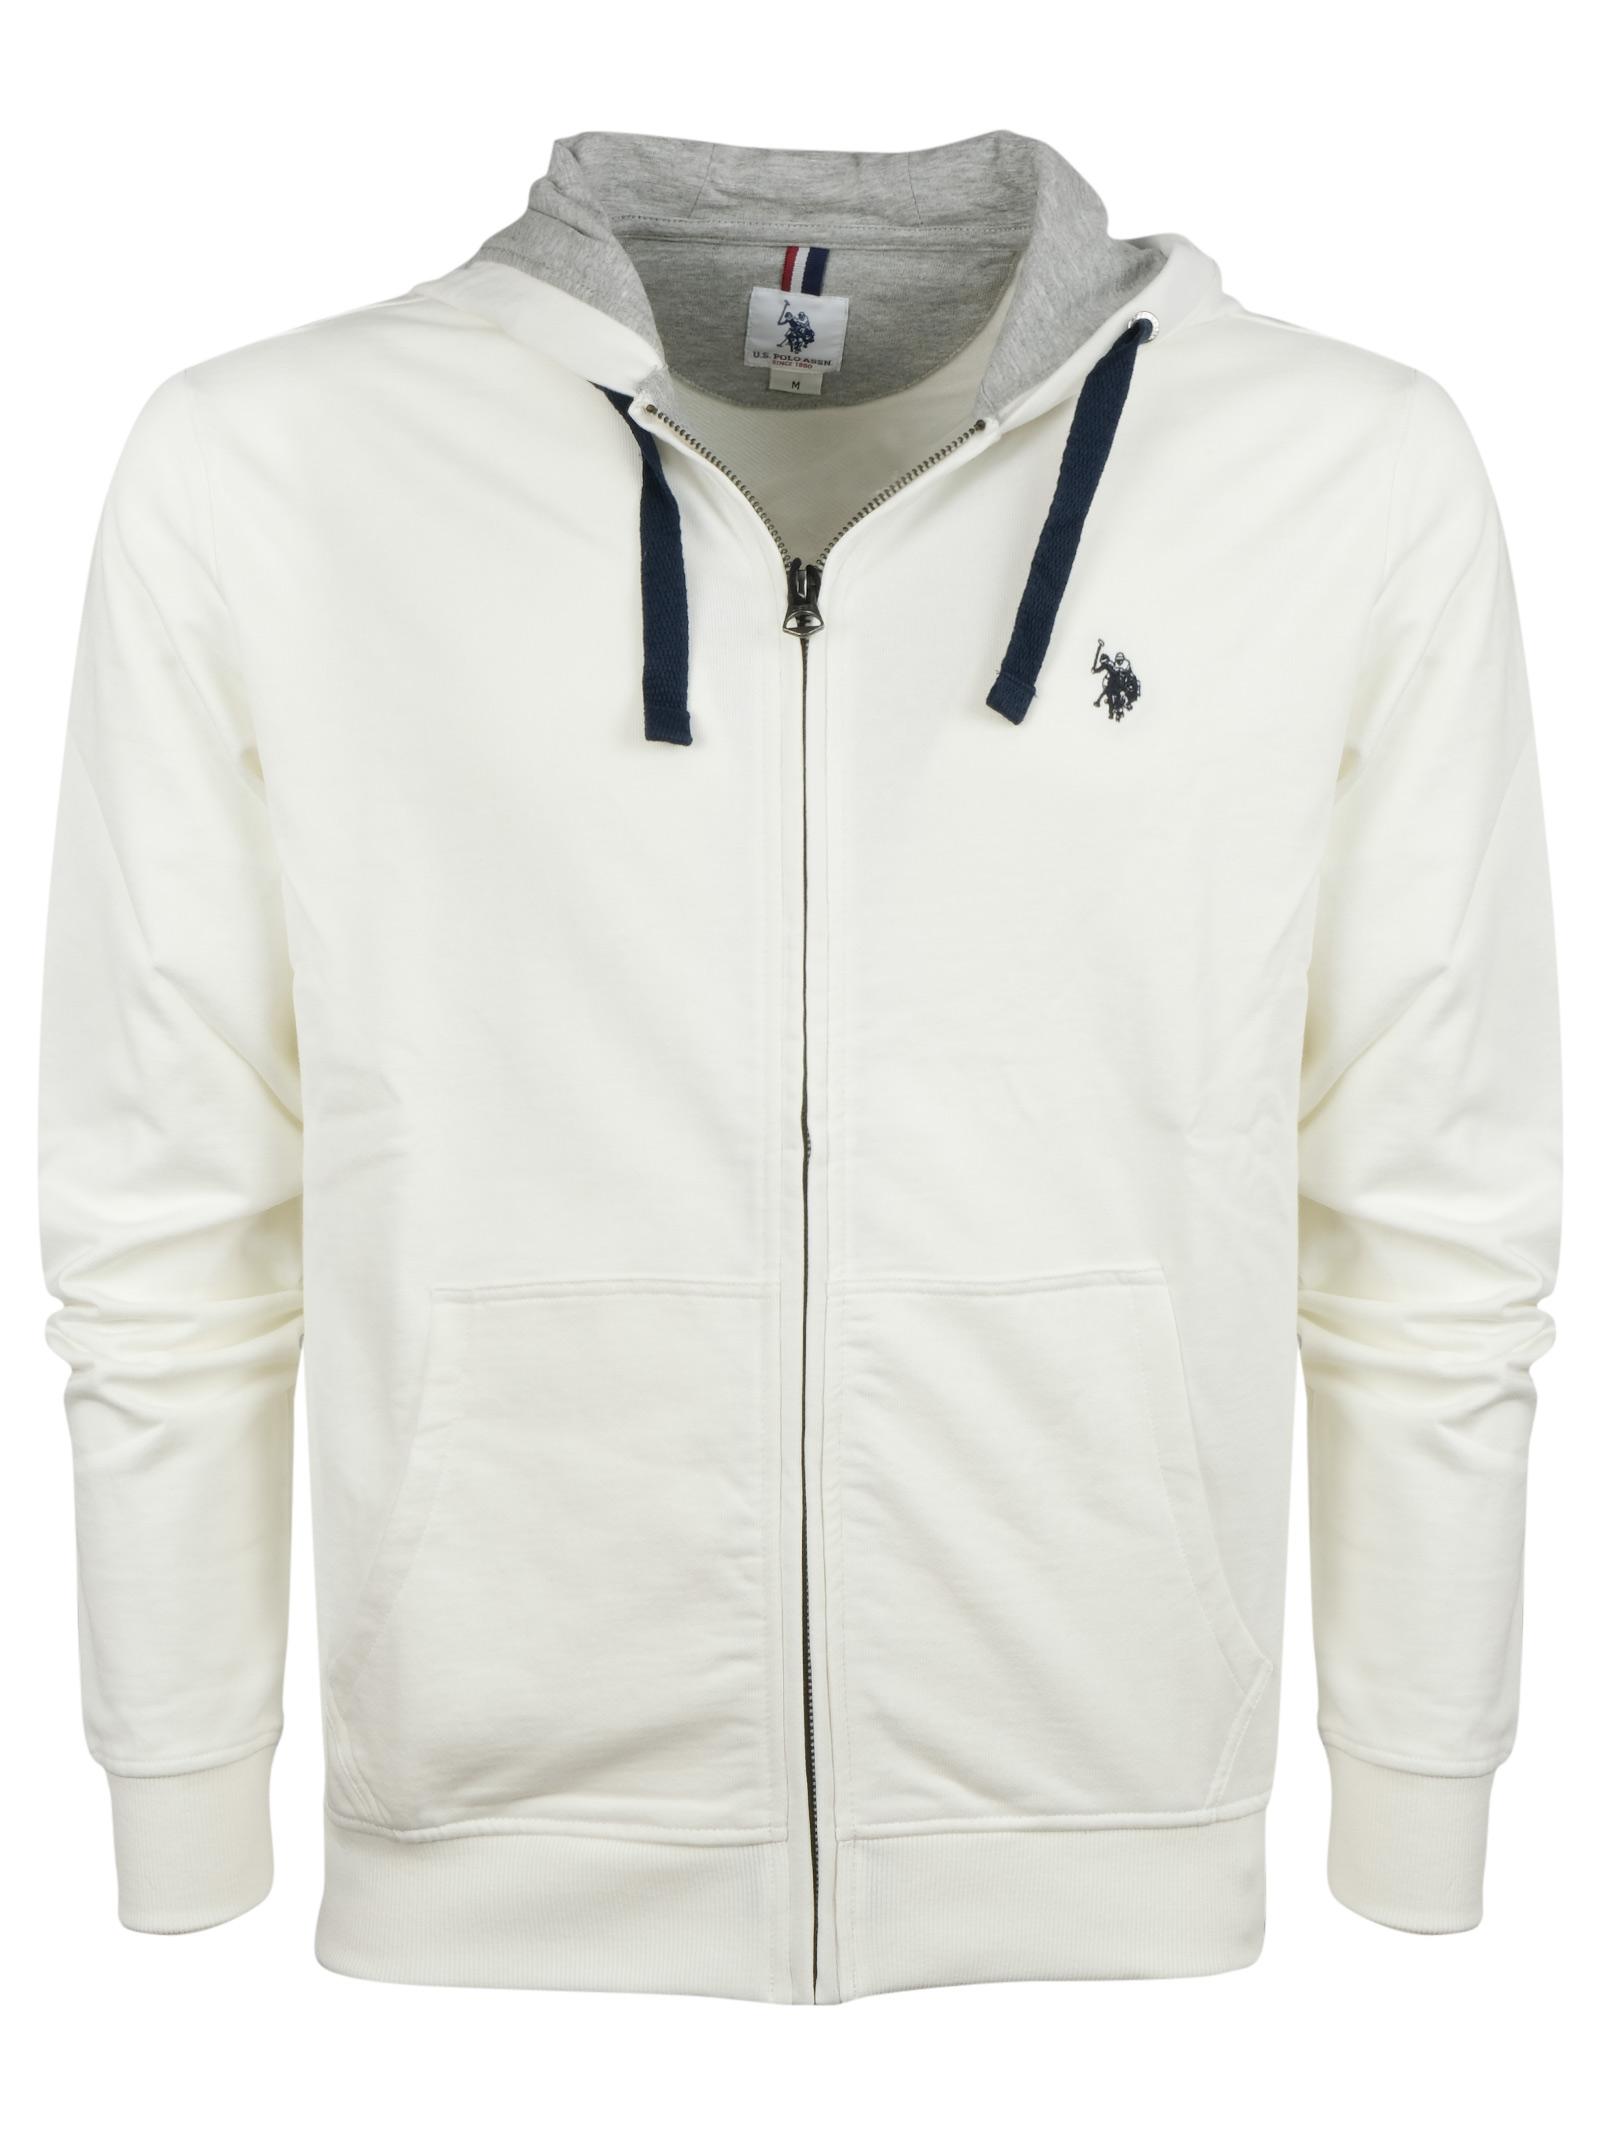 Hooded full zip sweat US POLO ASSN. | Sweats | 162 60020 52088101